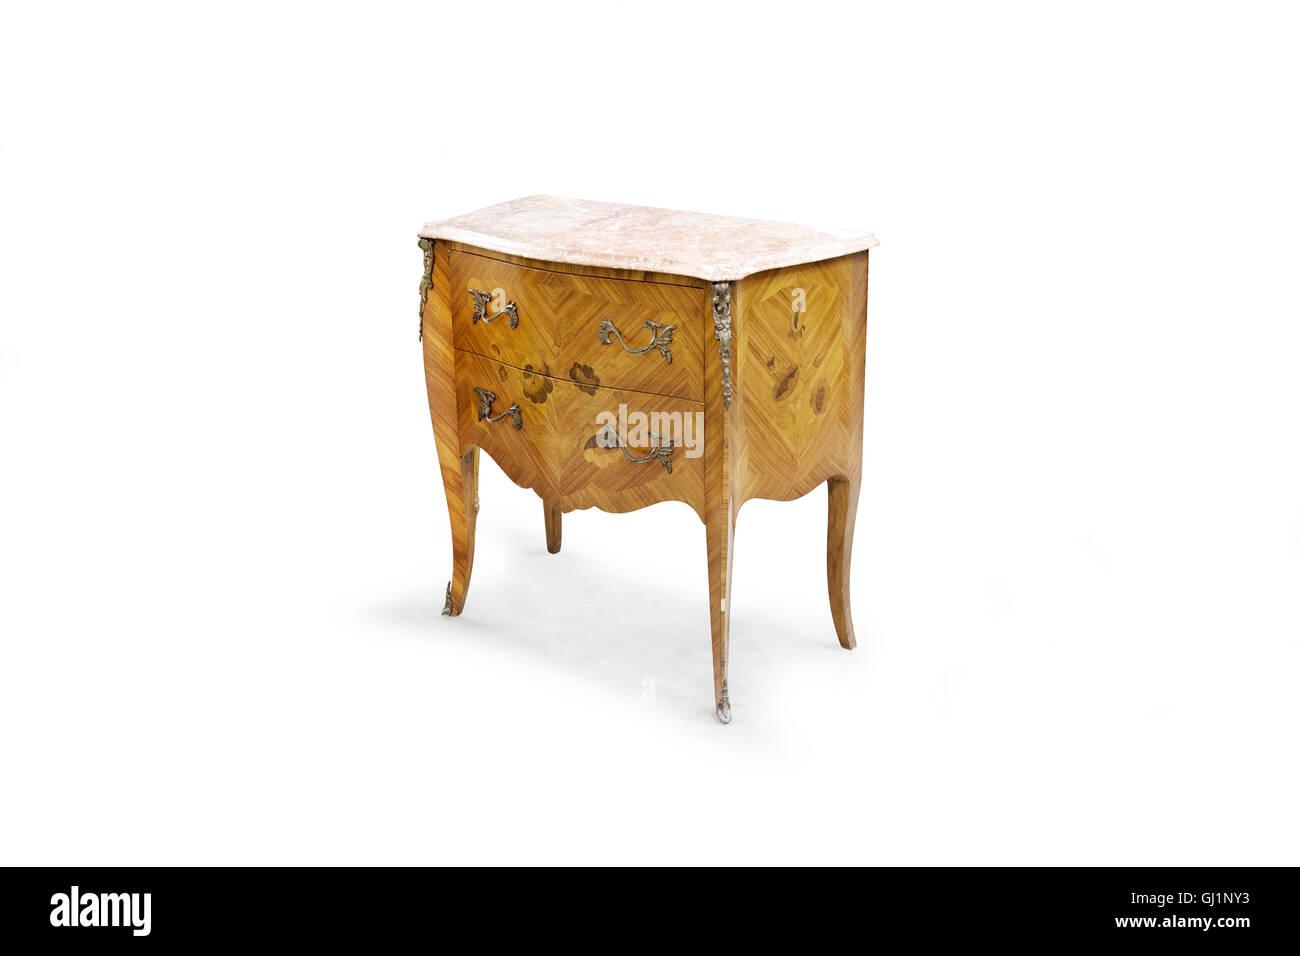 Vintage dresser on the white background. - Stock Image